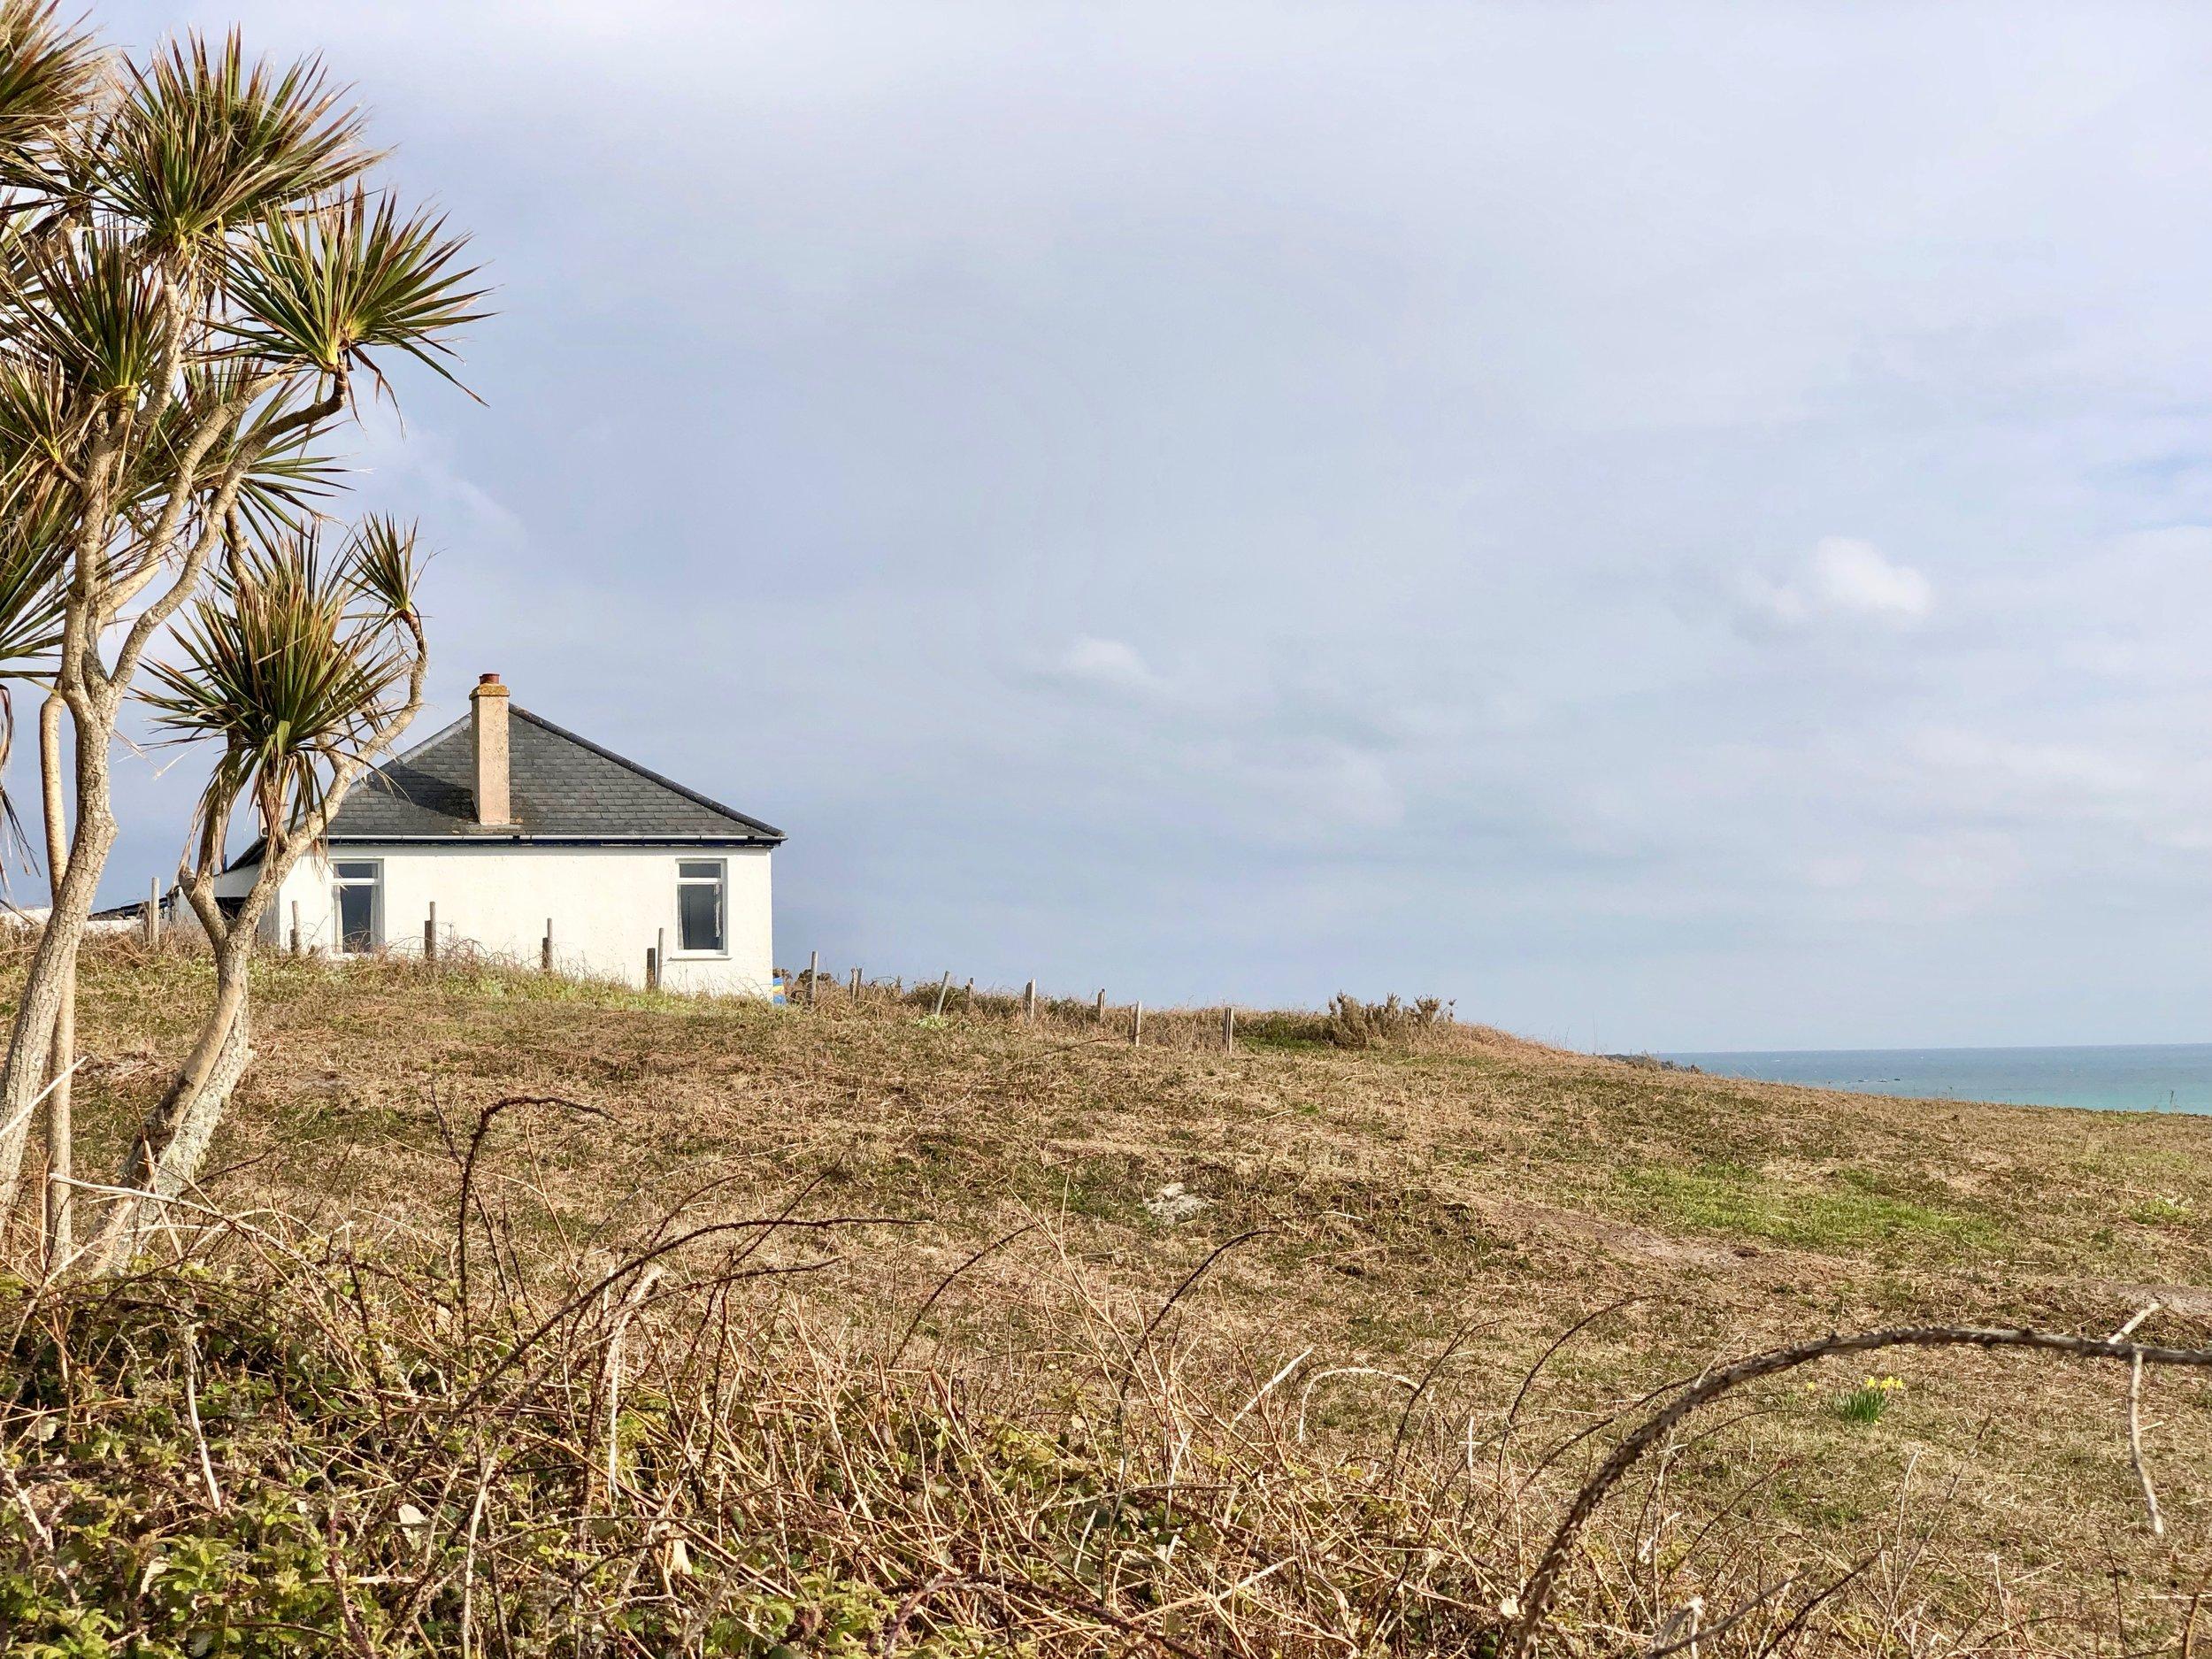 St. Martins, Scilly Isles (1).jpg